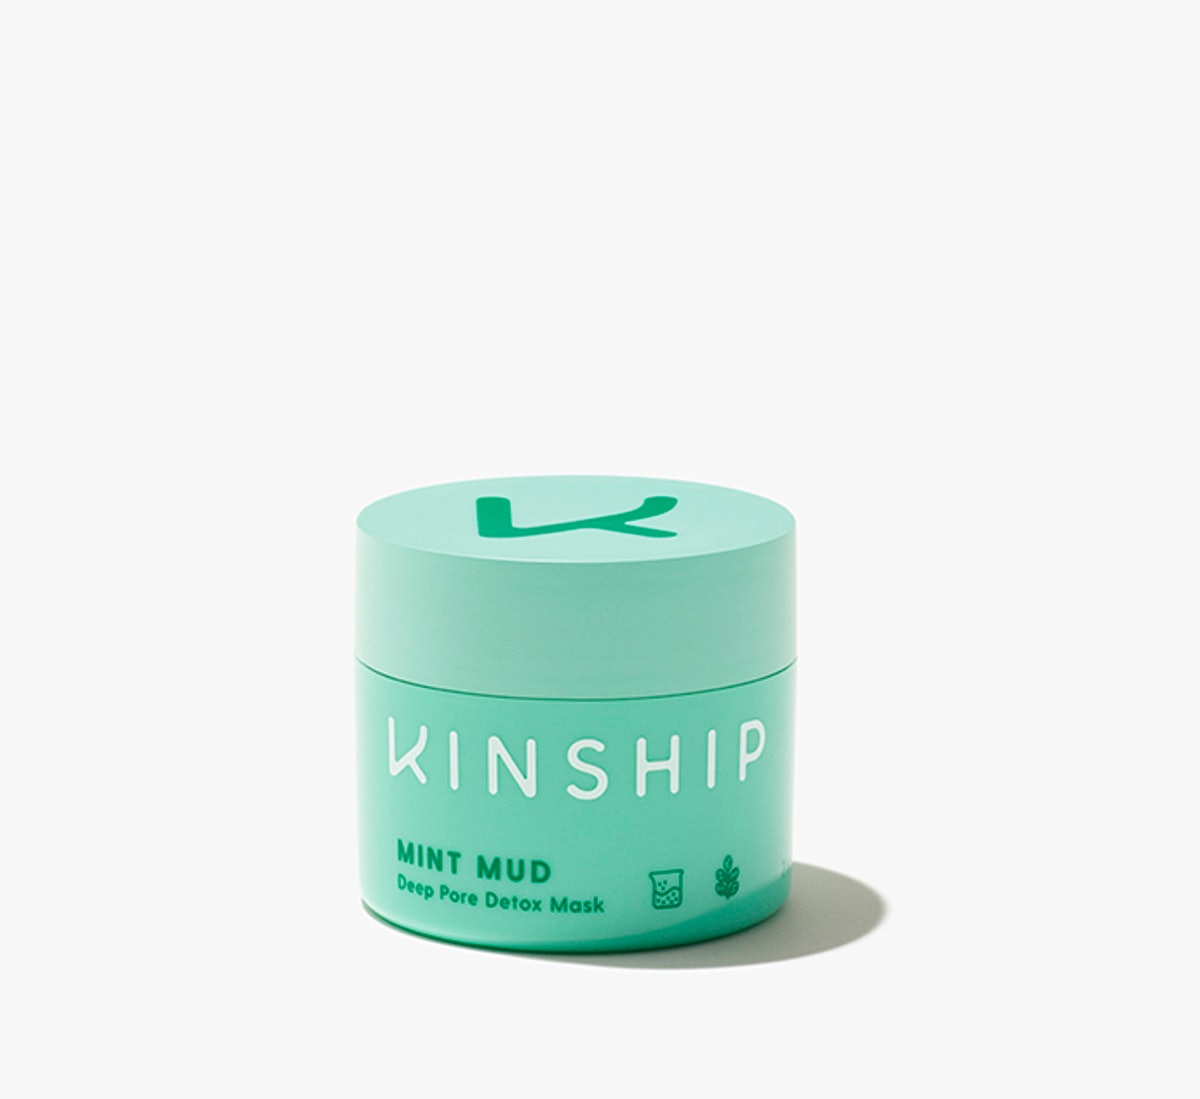 Mint Mud Deep Pore Detox Mask